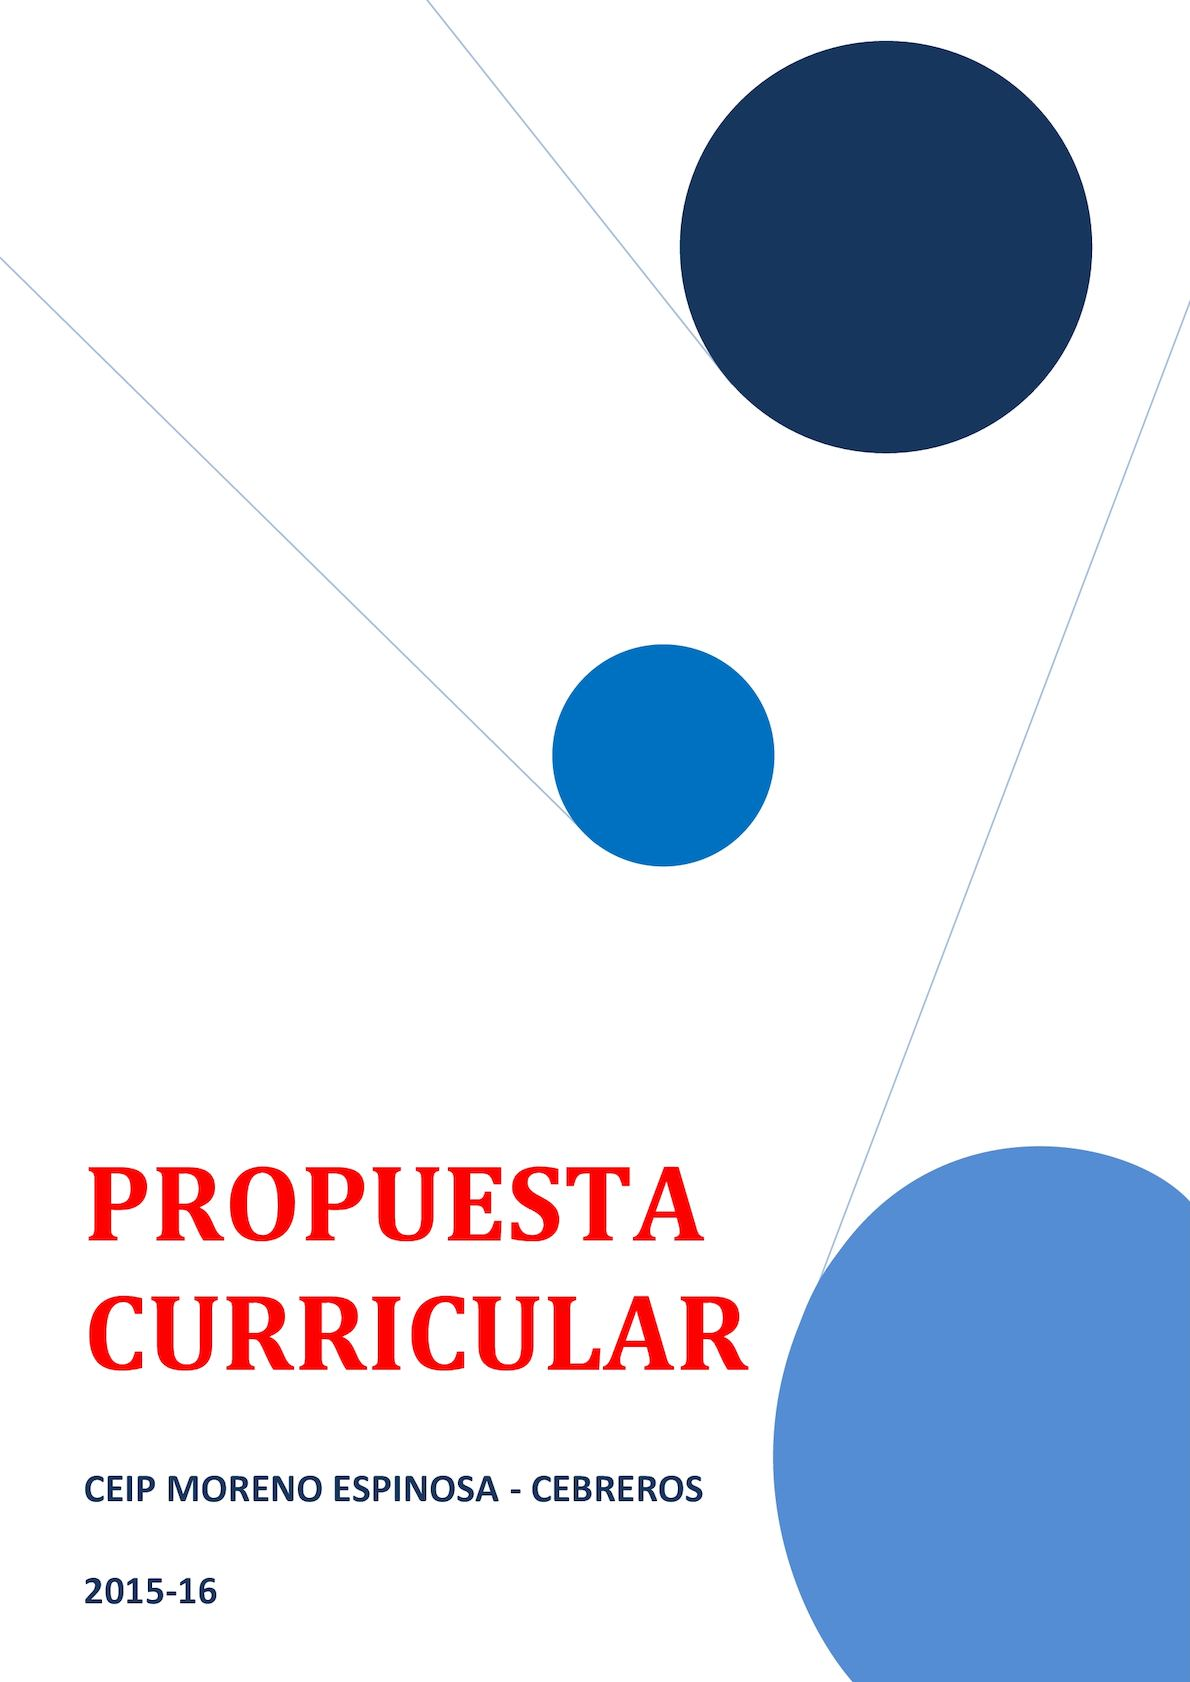 Propuesta Curricular Moreno Espinosa